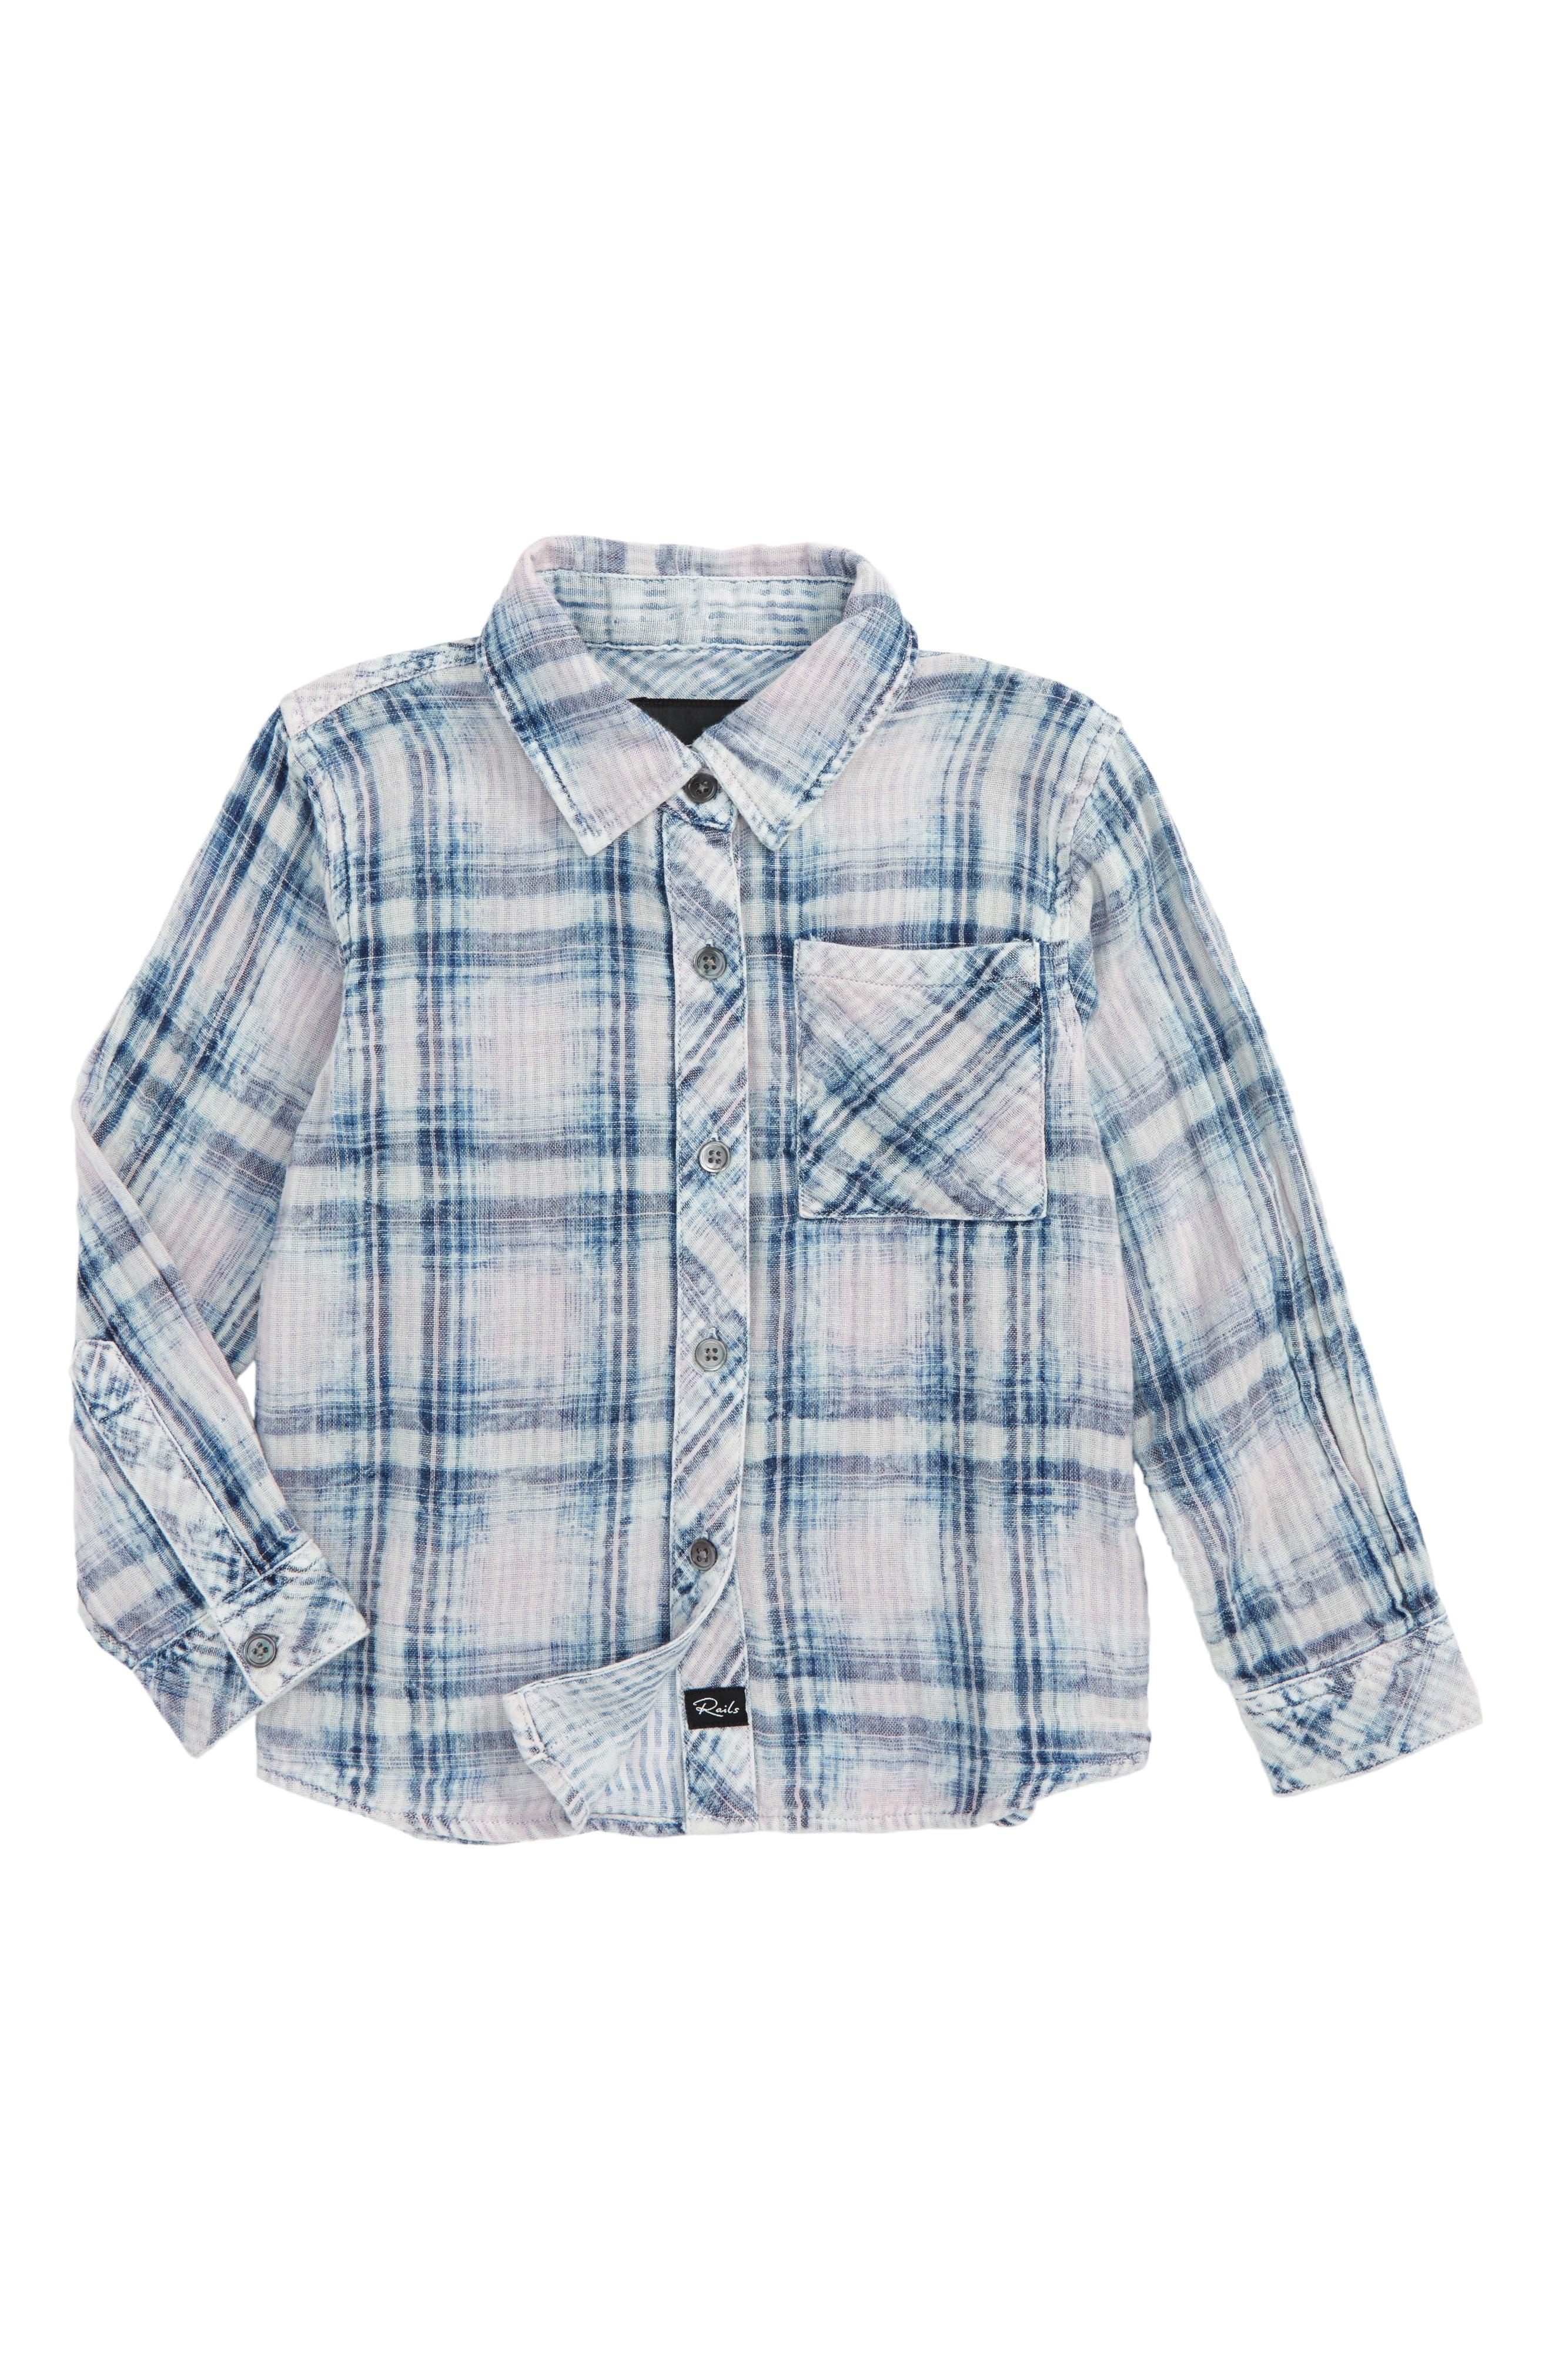 Alternate Image 1 Selected - Rails Hudson Plaid Shirt (Toddler Girls, Little Girls & Big Girls)